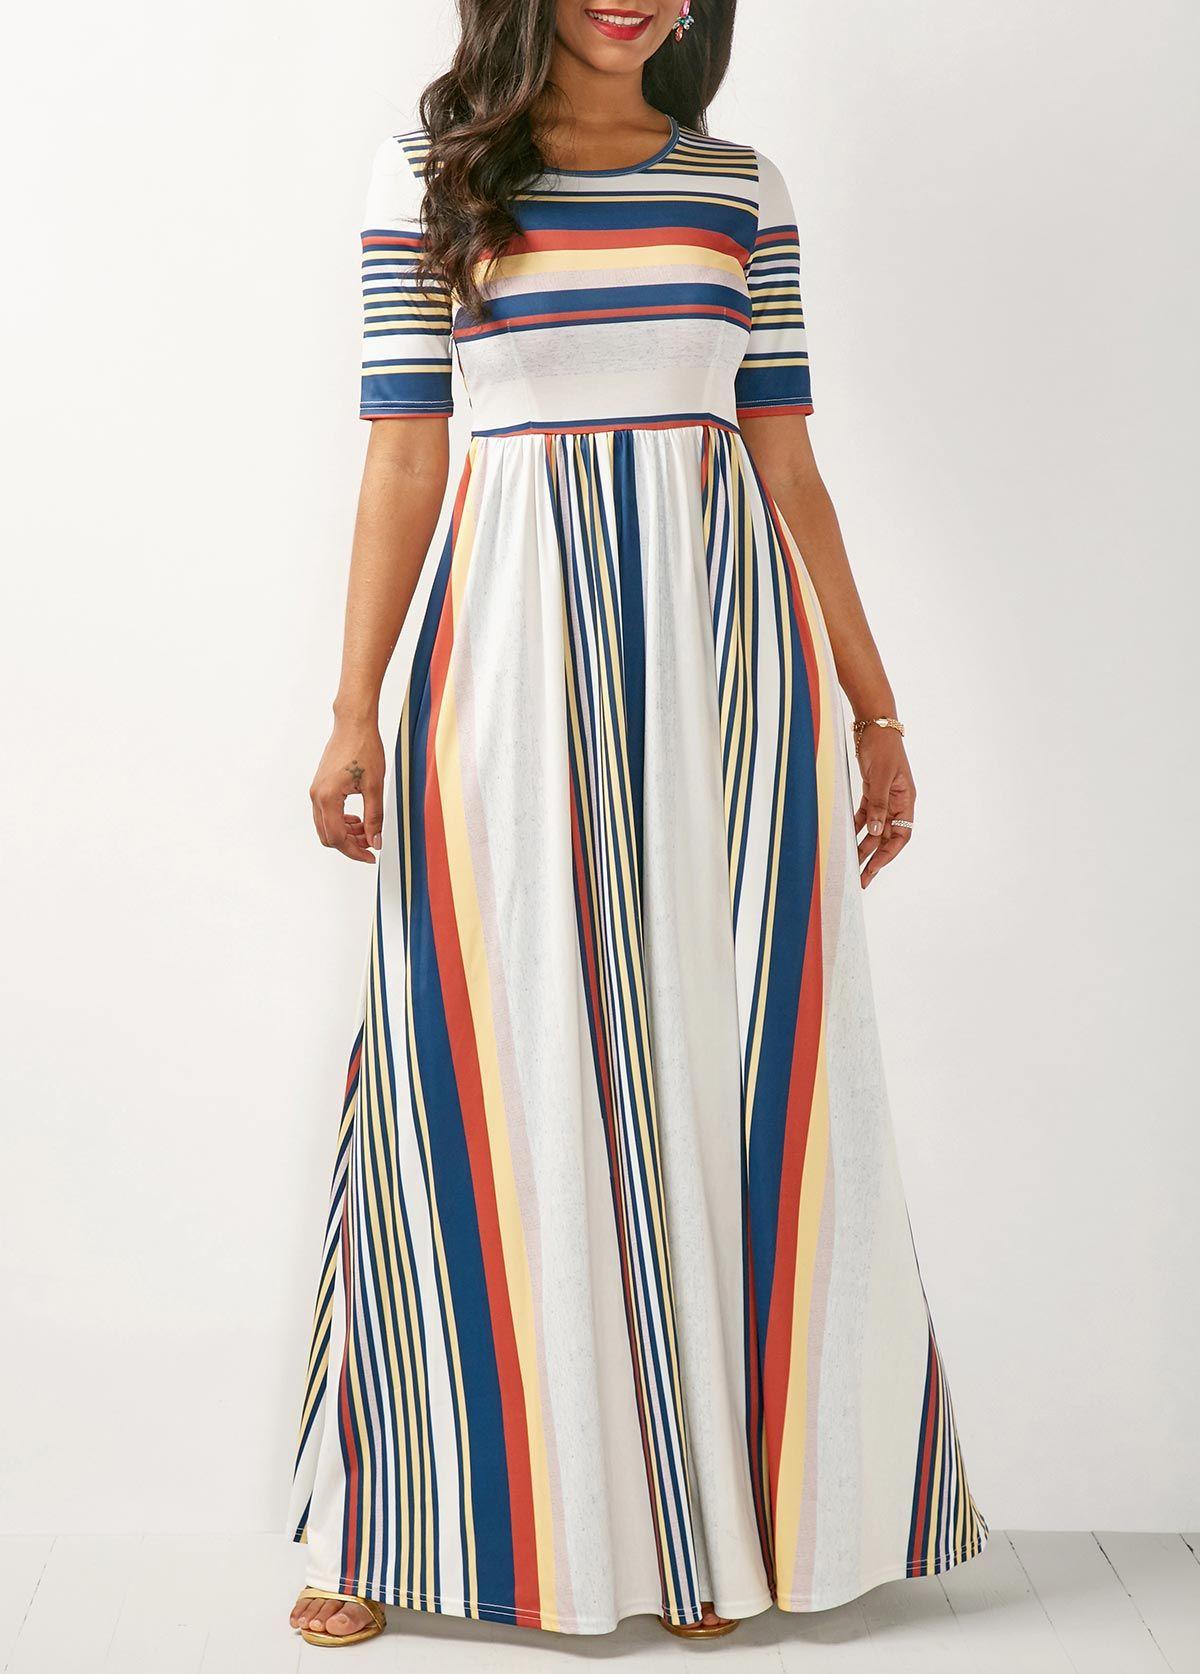 Printed white high waist maxi dress high waist short maxi dresses